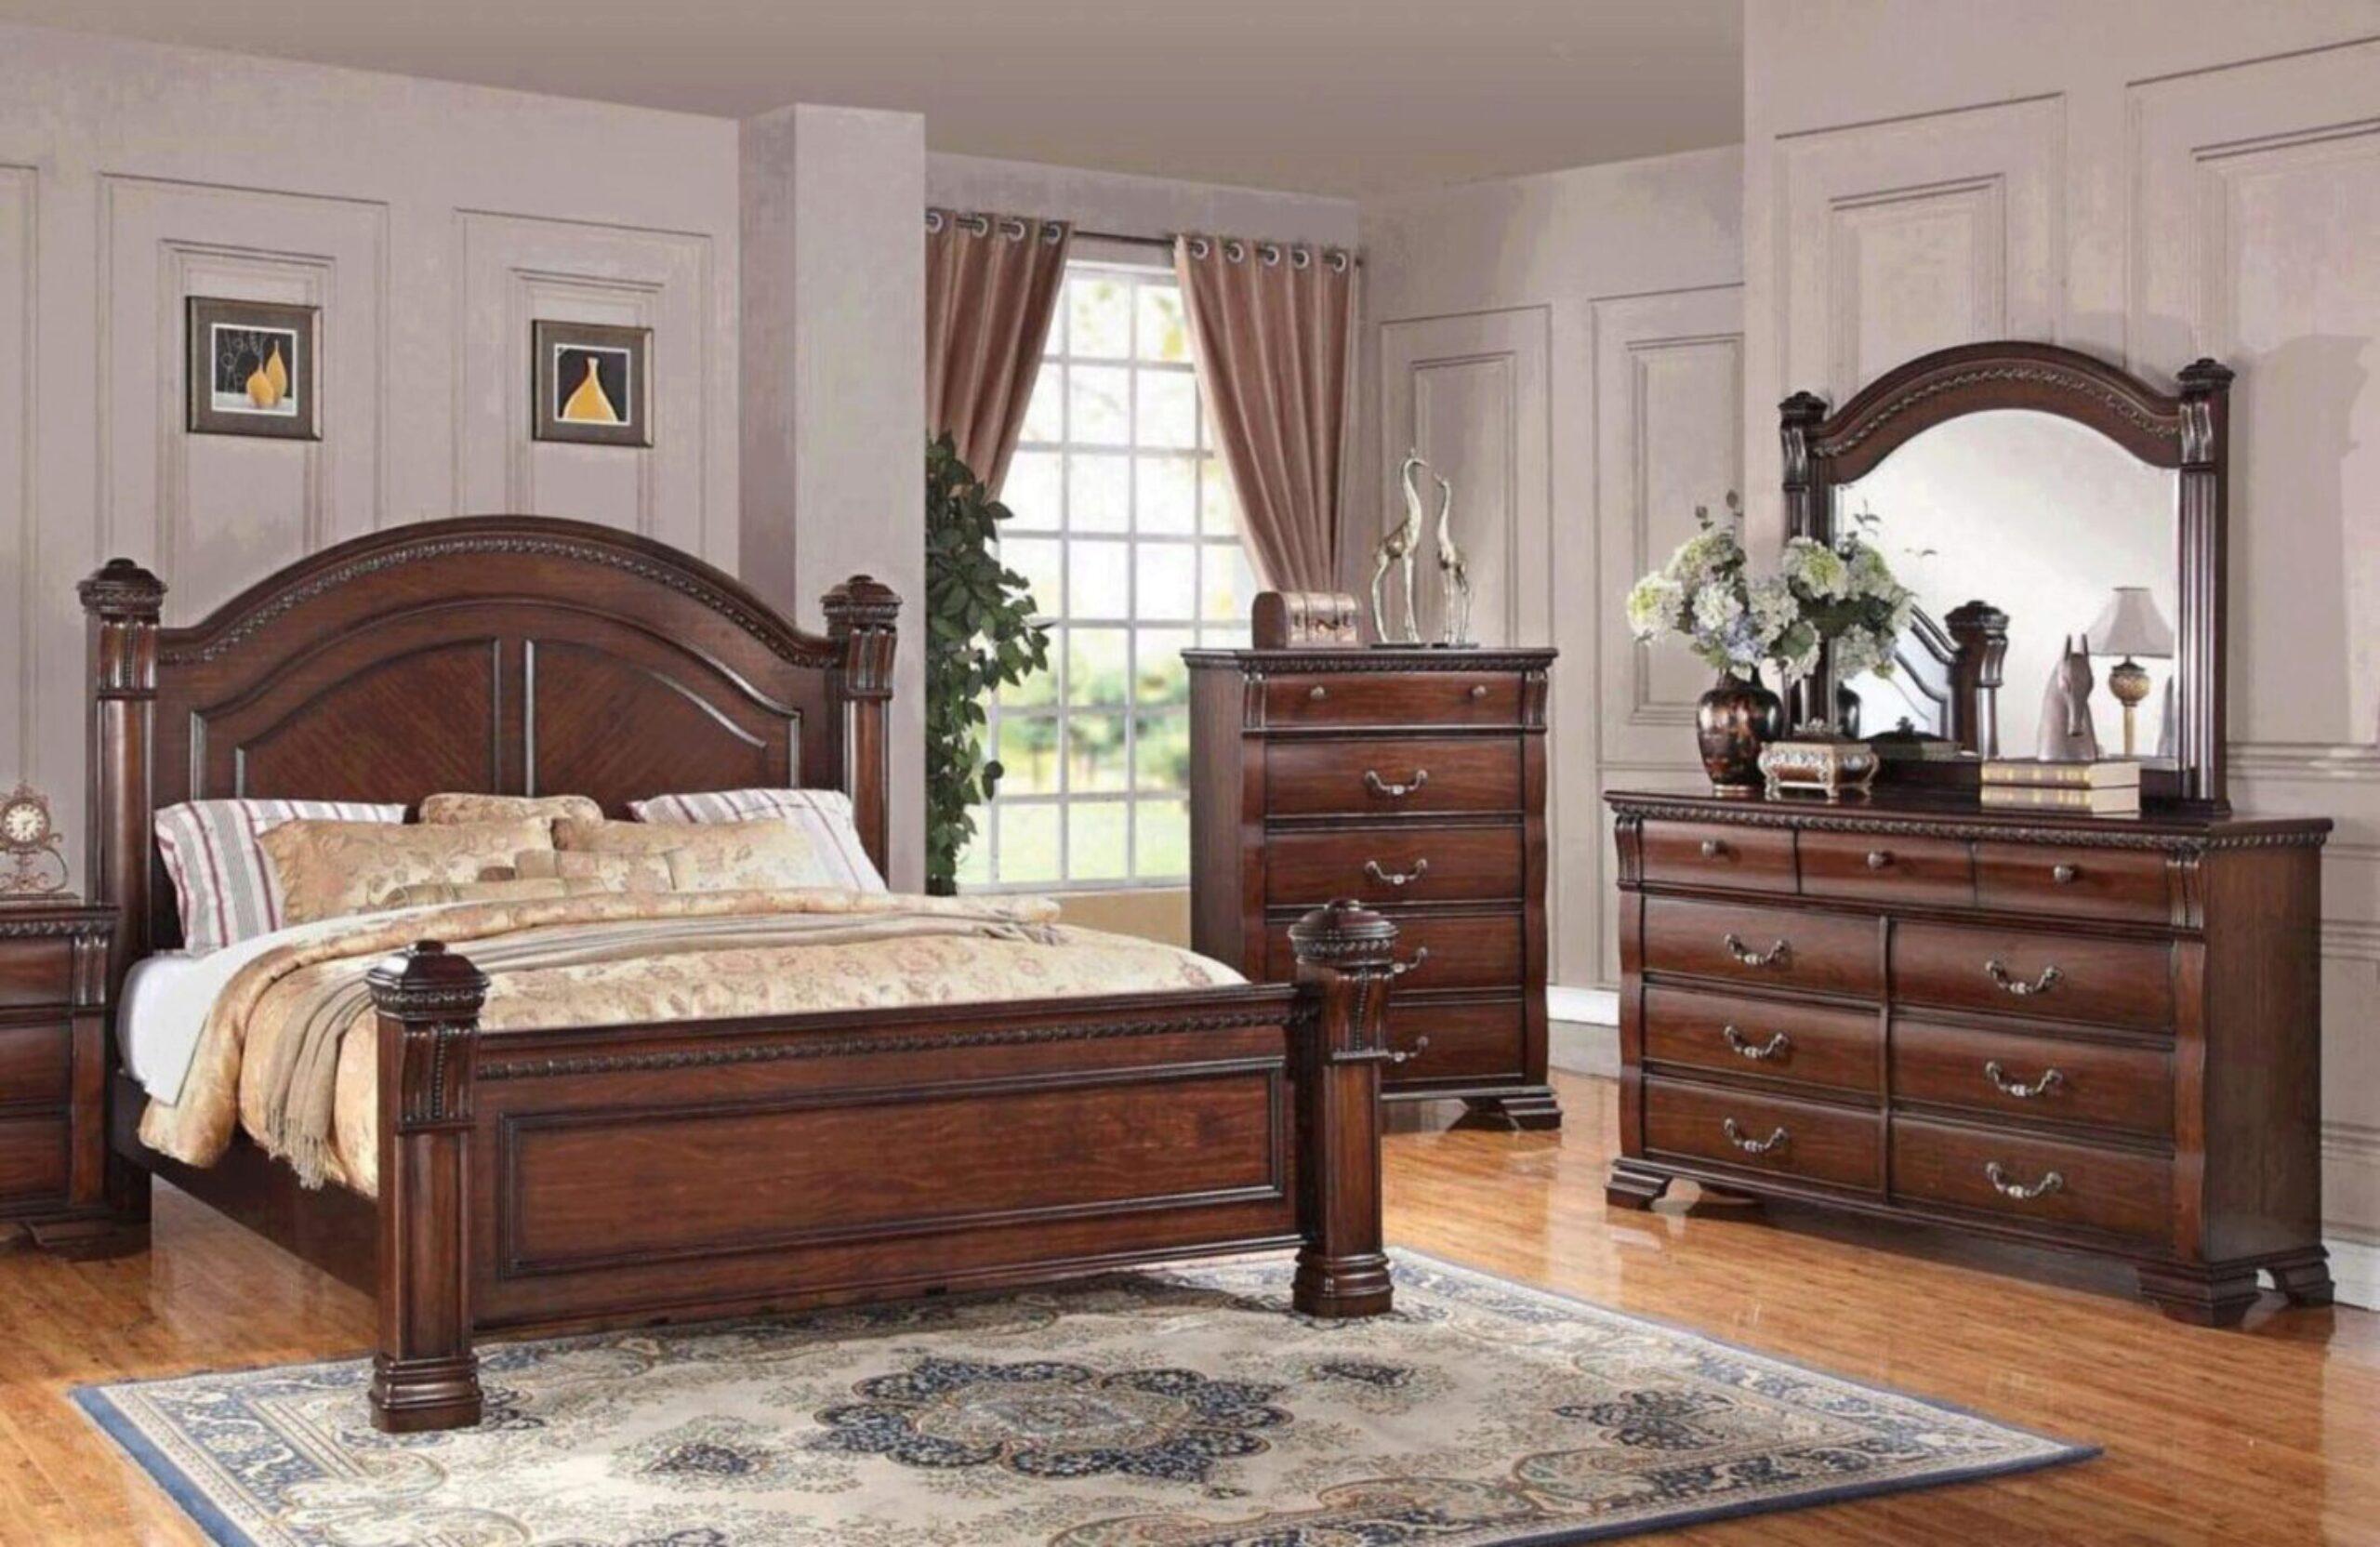 warm cognac isabella 1411 king bedroom set 3pcs bernards solid wood traditional